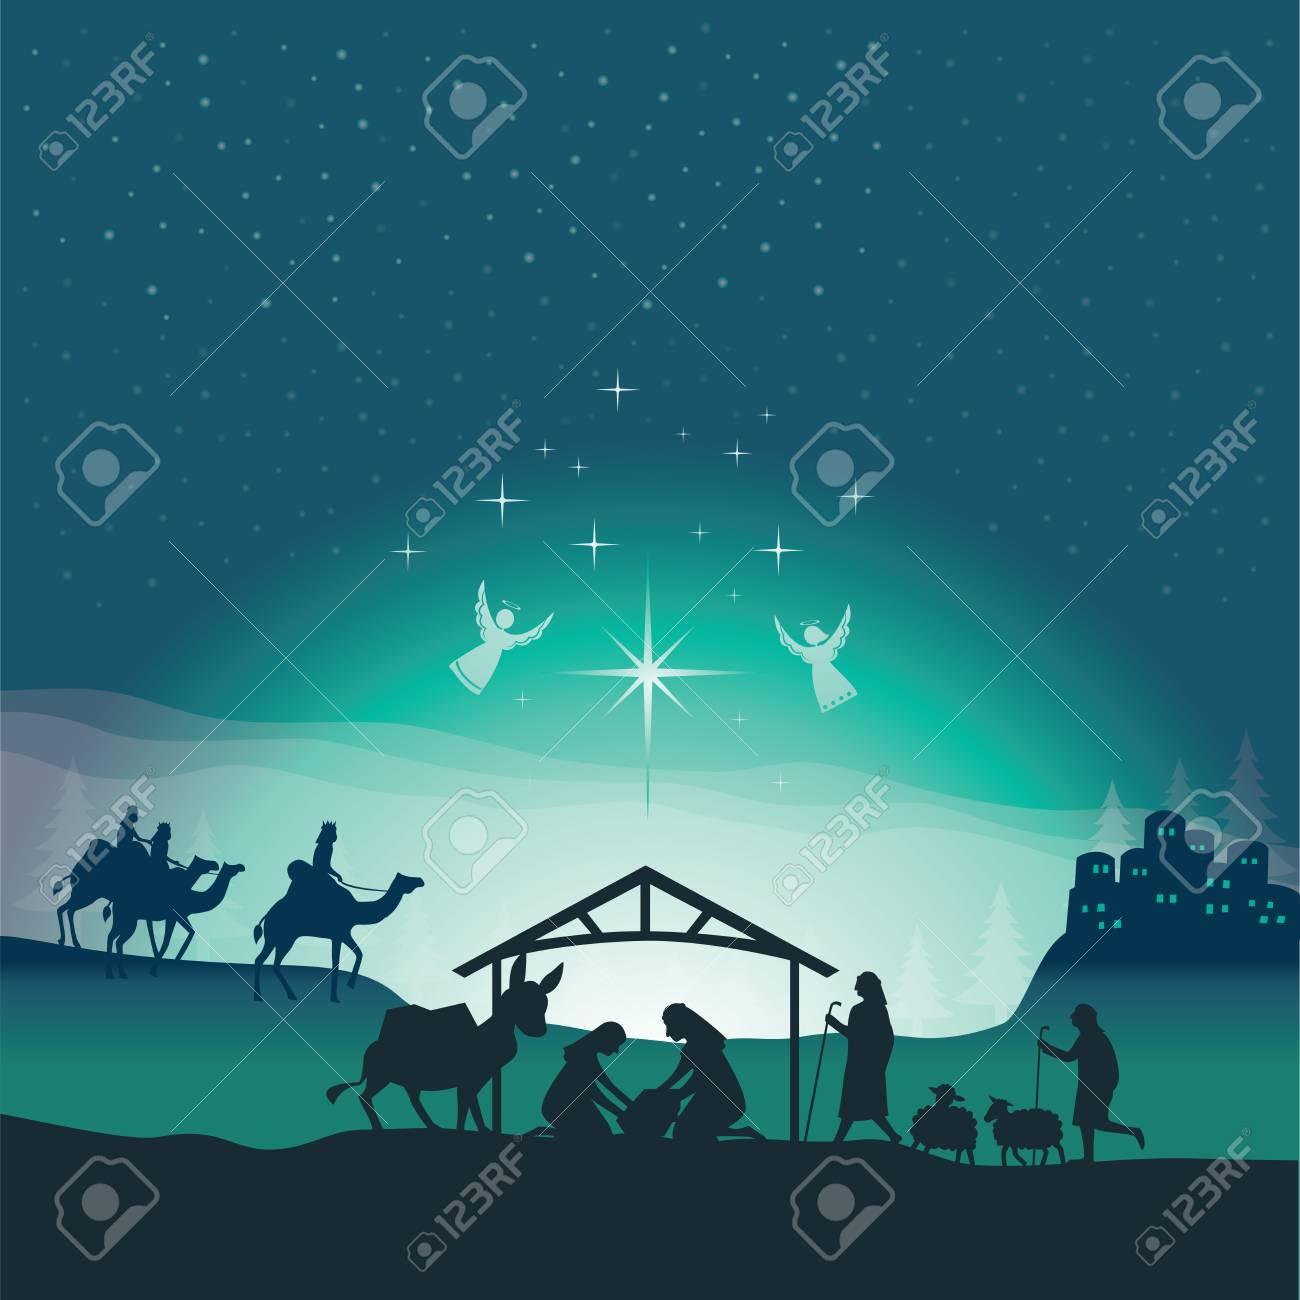 Nativita Natale Immagini.Scena Di Nativita Di Natale